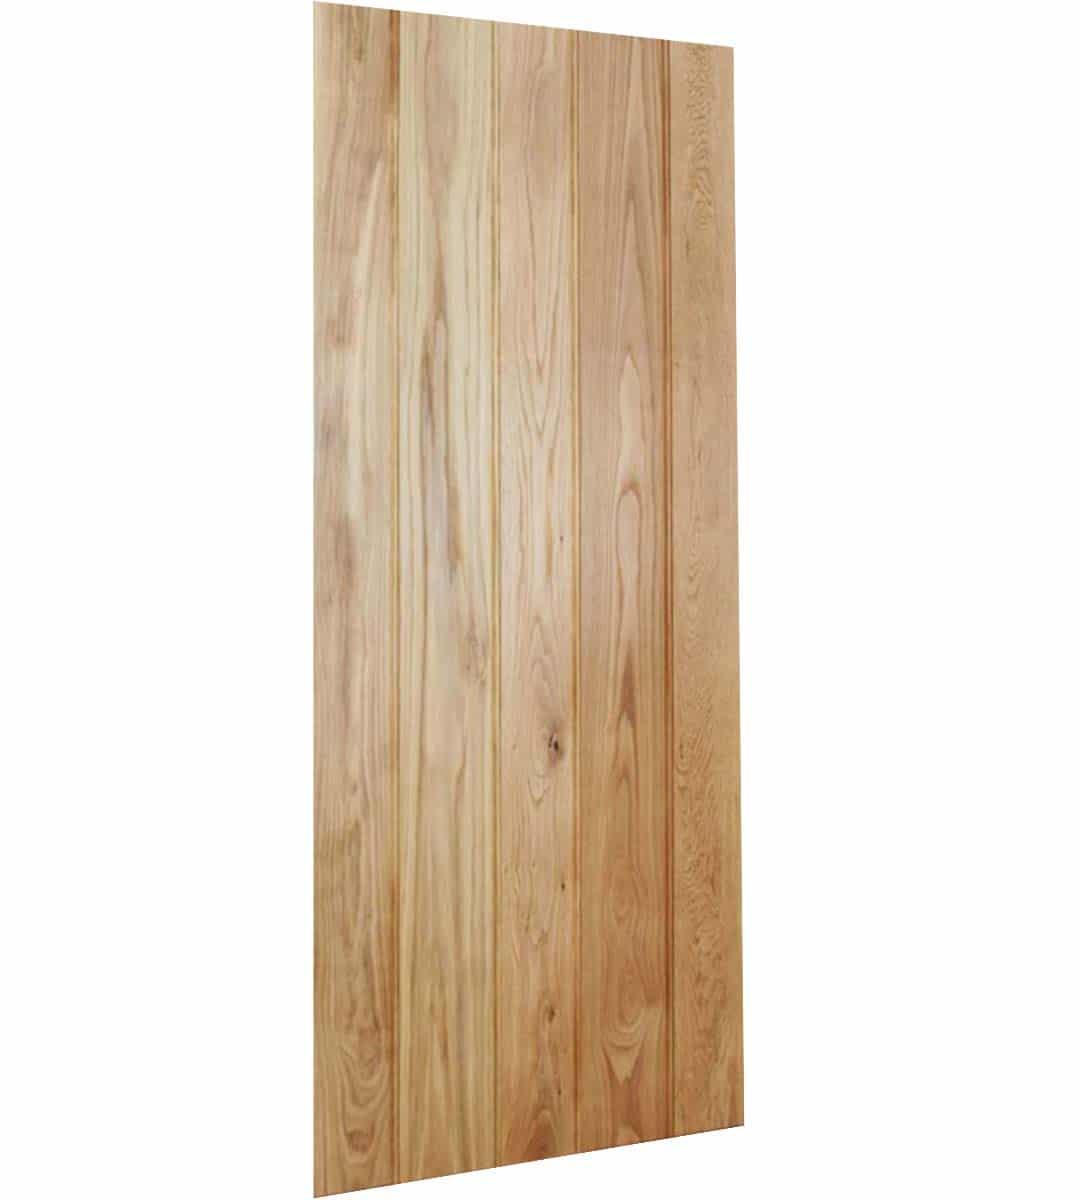 Solid Oak Door Button Bead Frame Ledged